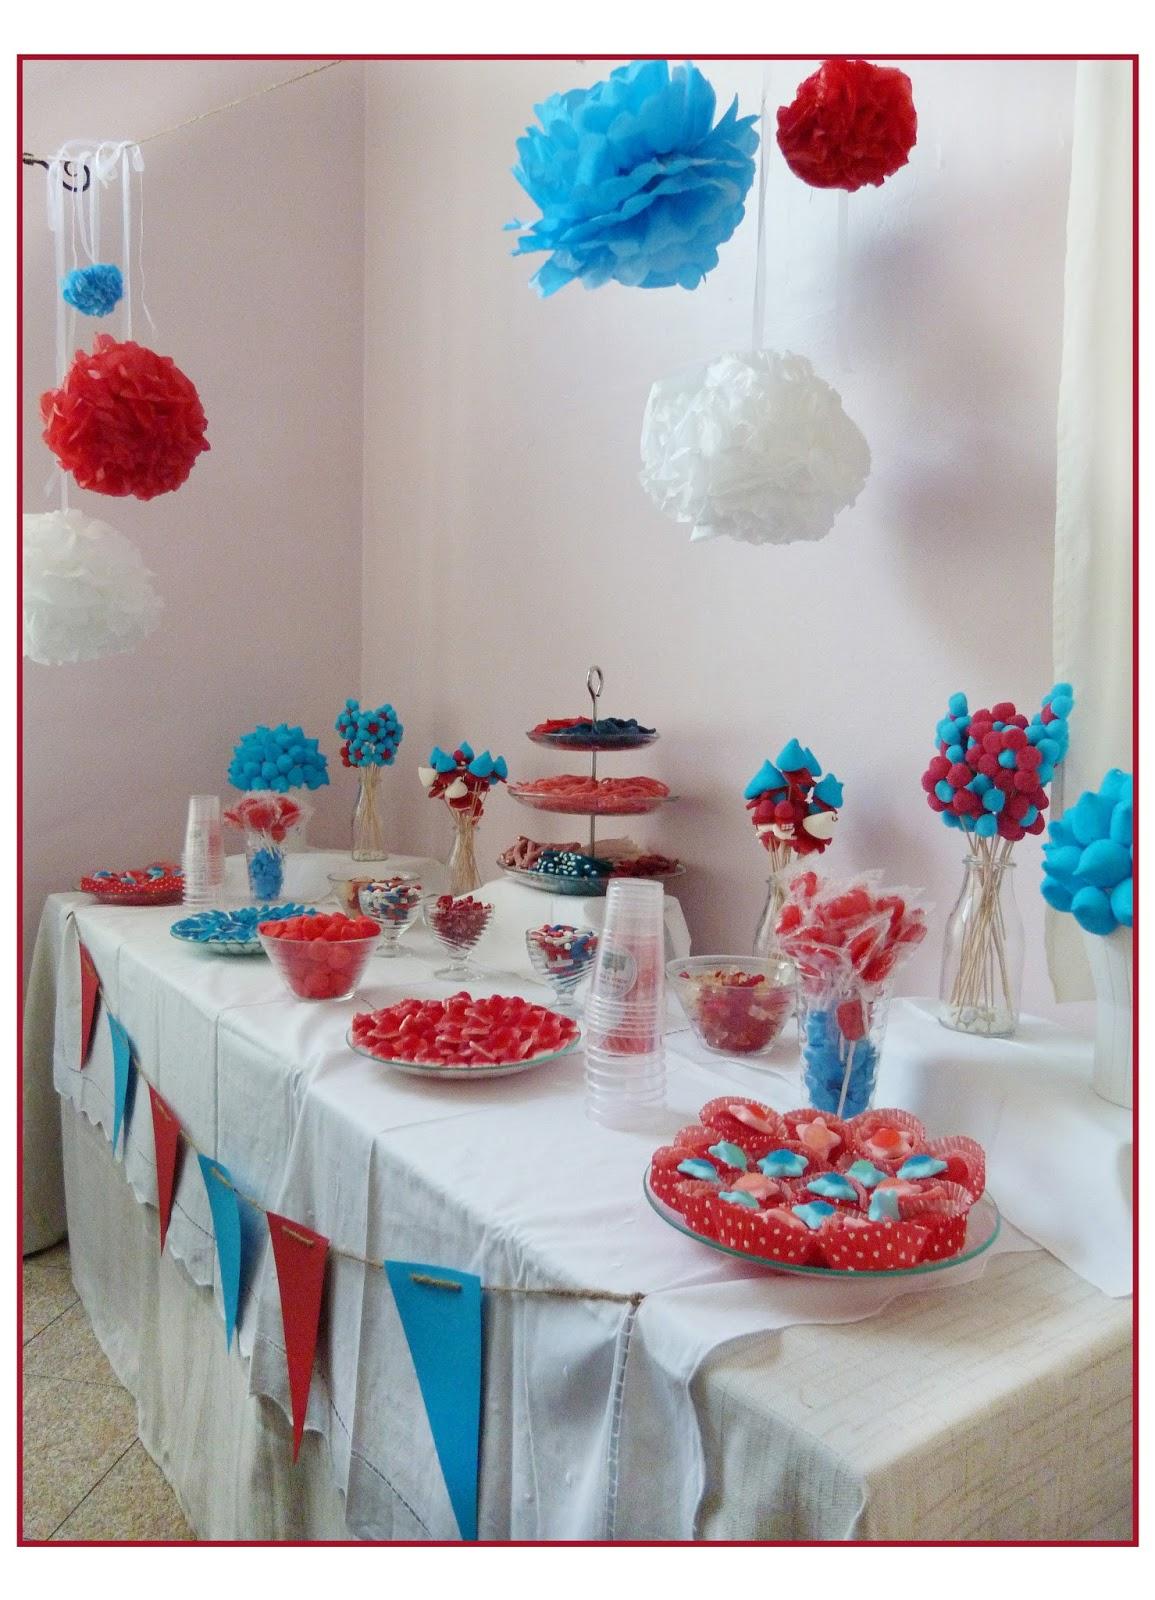 Cositas bbailon mesas tartas y brochetas de chuches - Mesas para comuniones ...